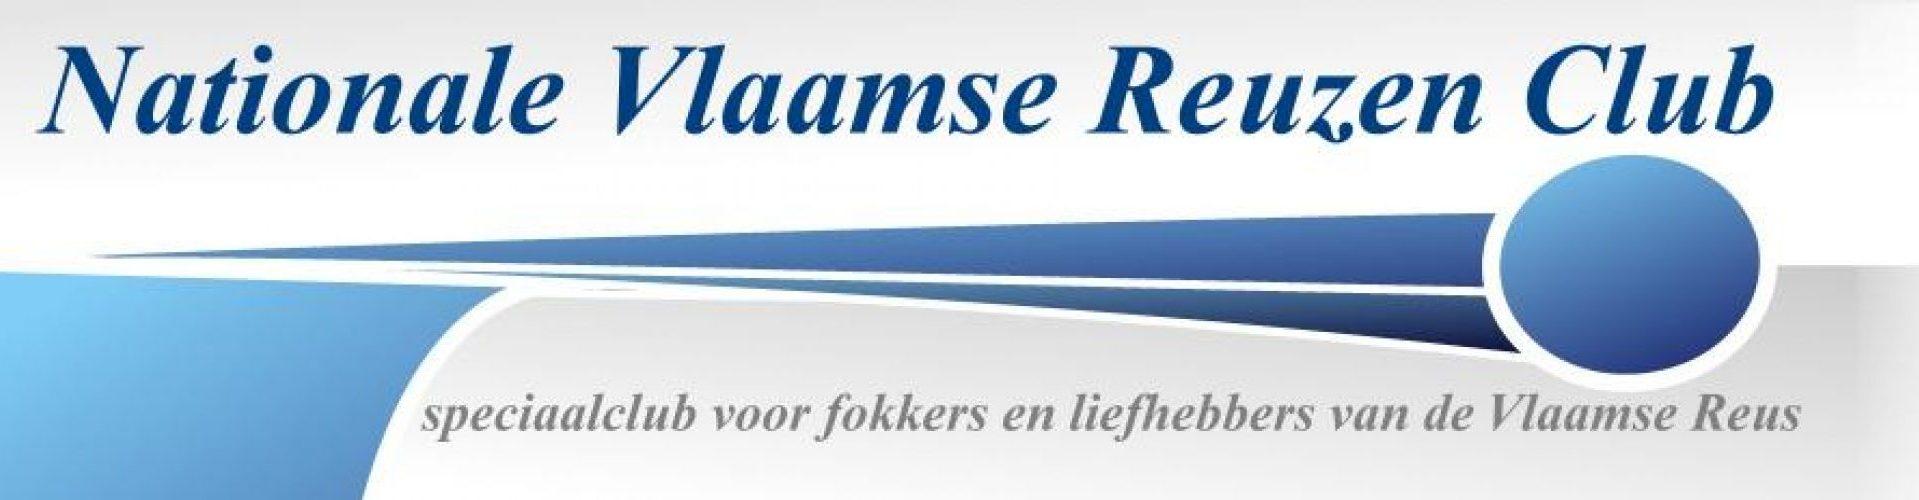 Nationale Vlaamse Reuzen Club